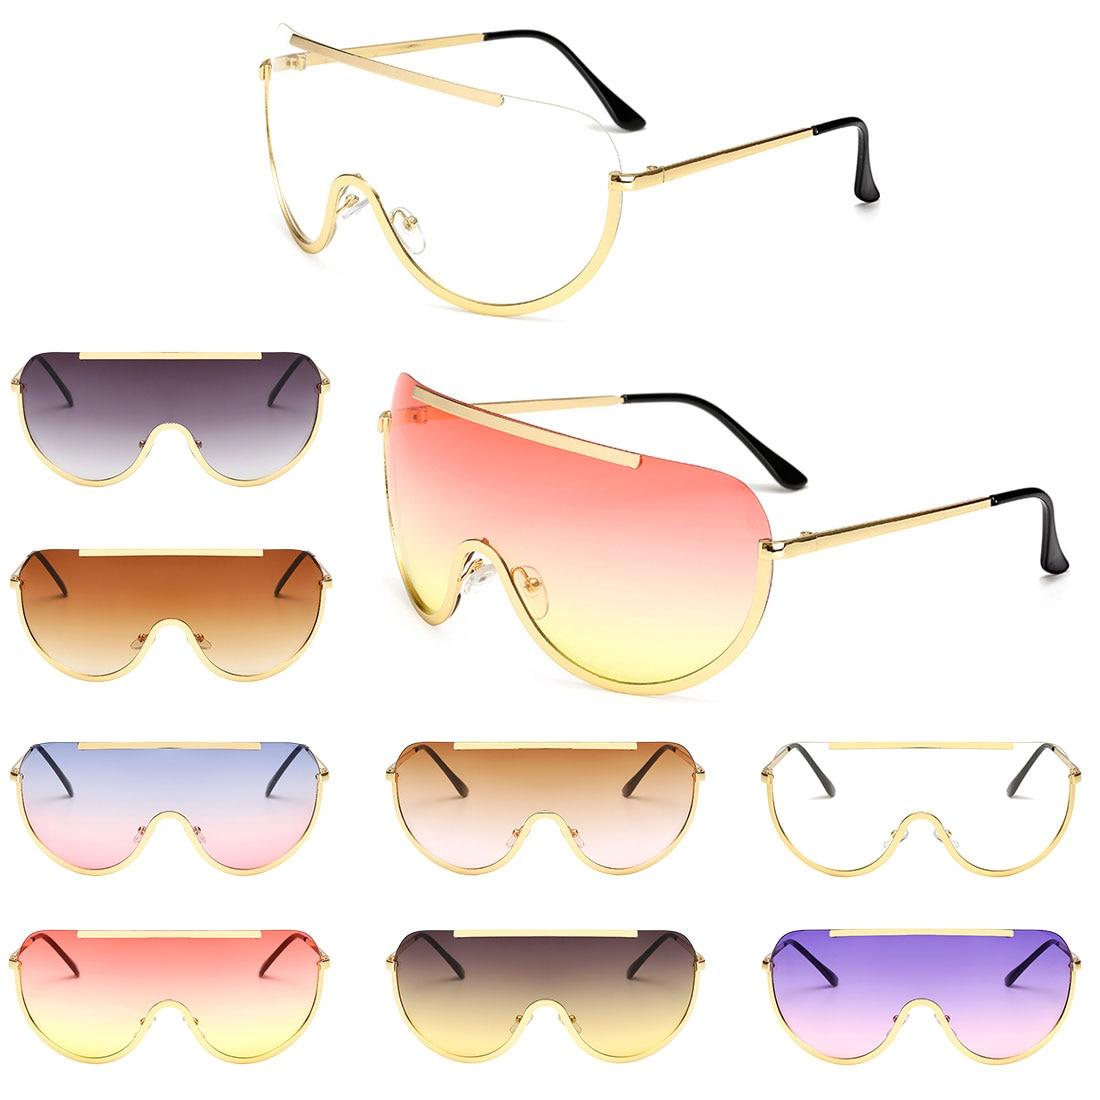 gafas de sol hombre Sunglasses Men Women 2019 Brand Designer Pilot Clear Sunglasses Big Frame Sun Glasses Lunette Femme in Women 39 s Sunglasses from Apparel Accessories